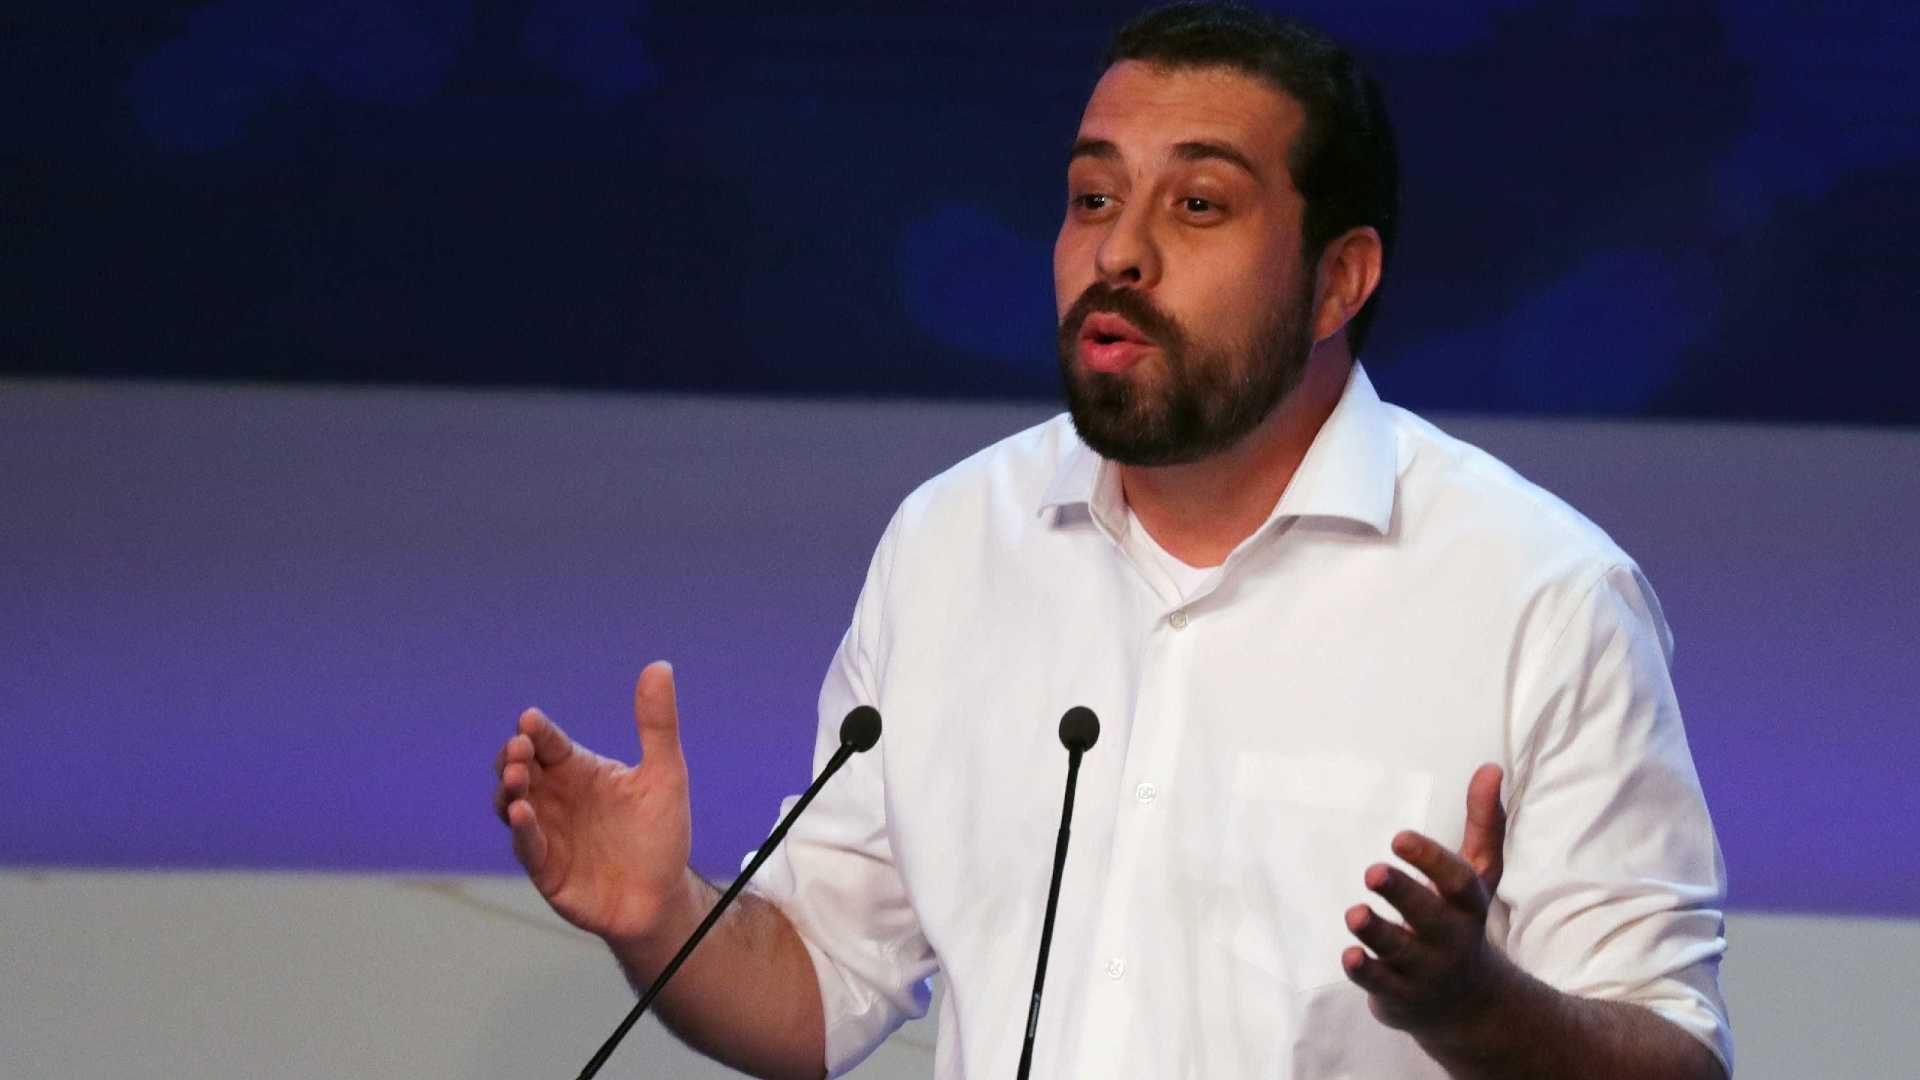 naom 5b75a8296c0da - Boulos encontrará Haddad para anunciar apoio ao PT